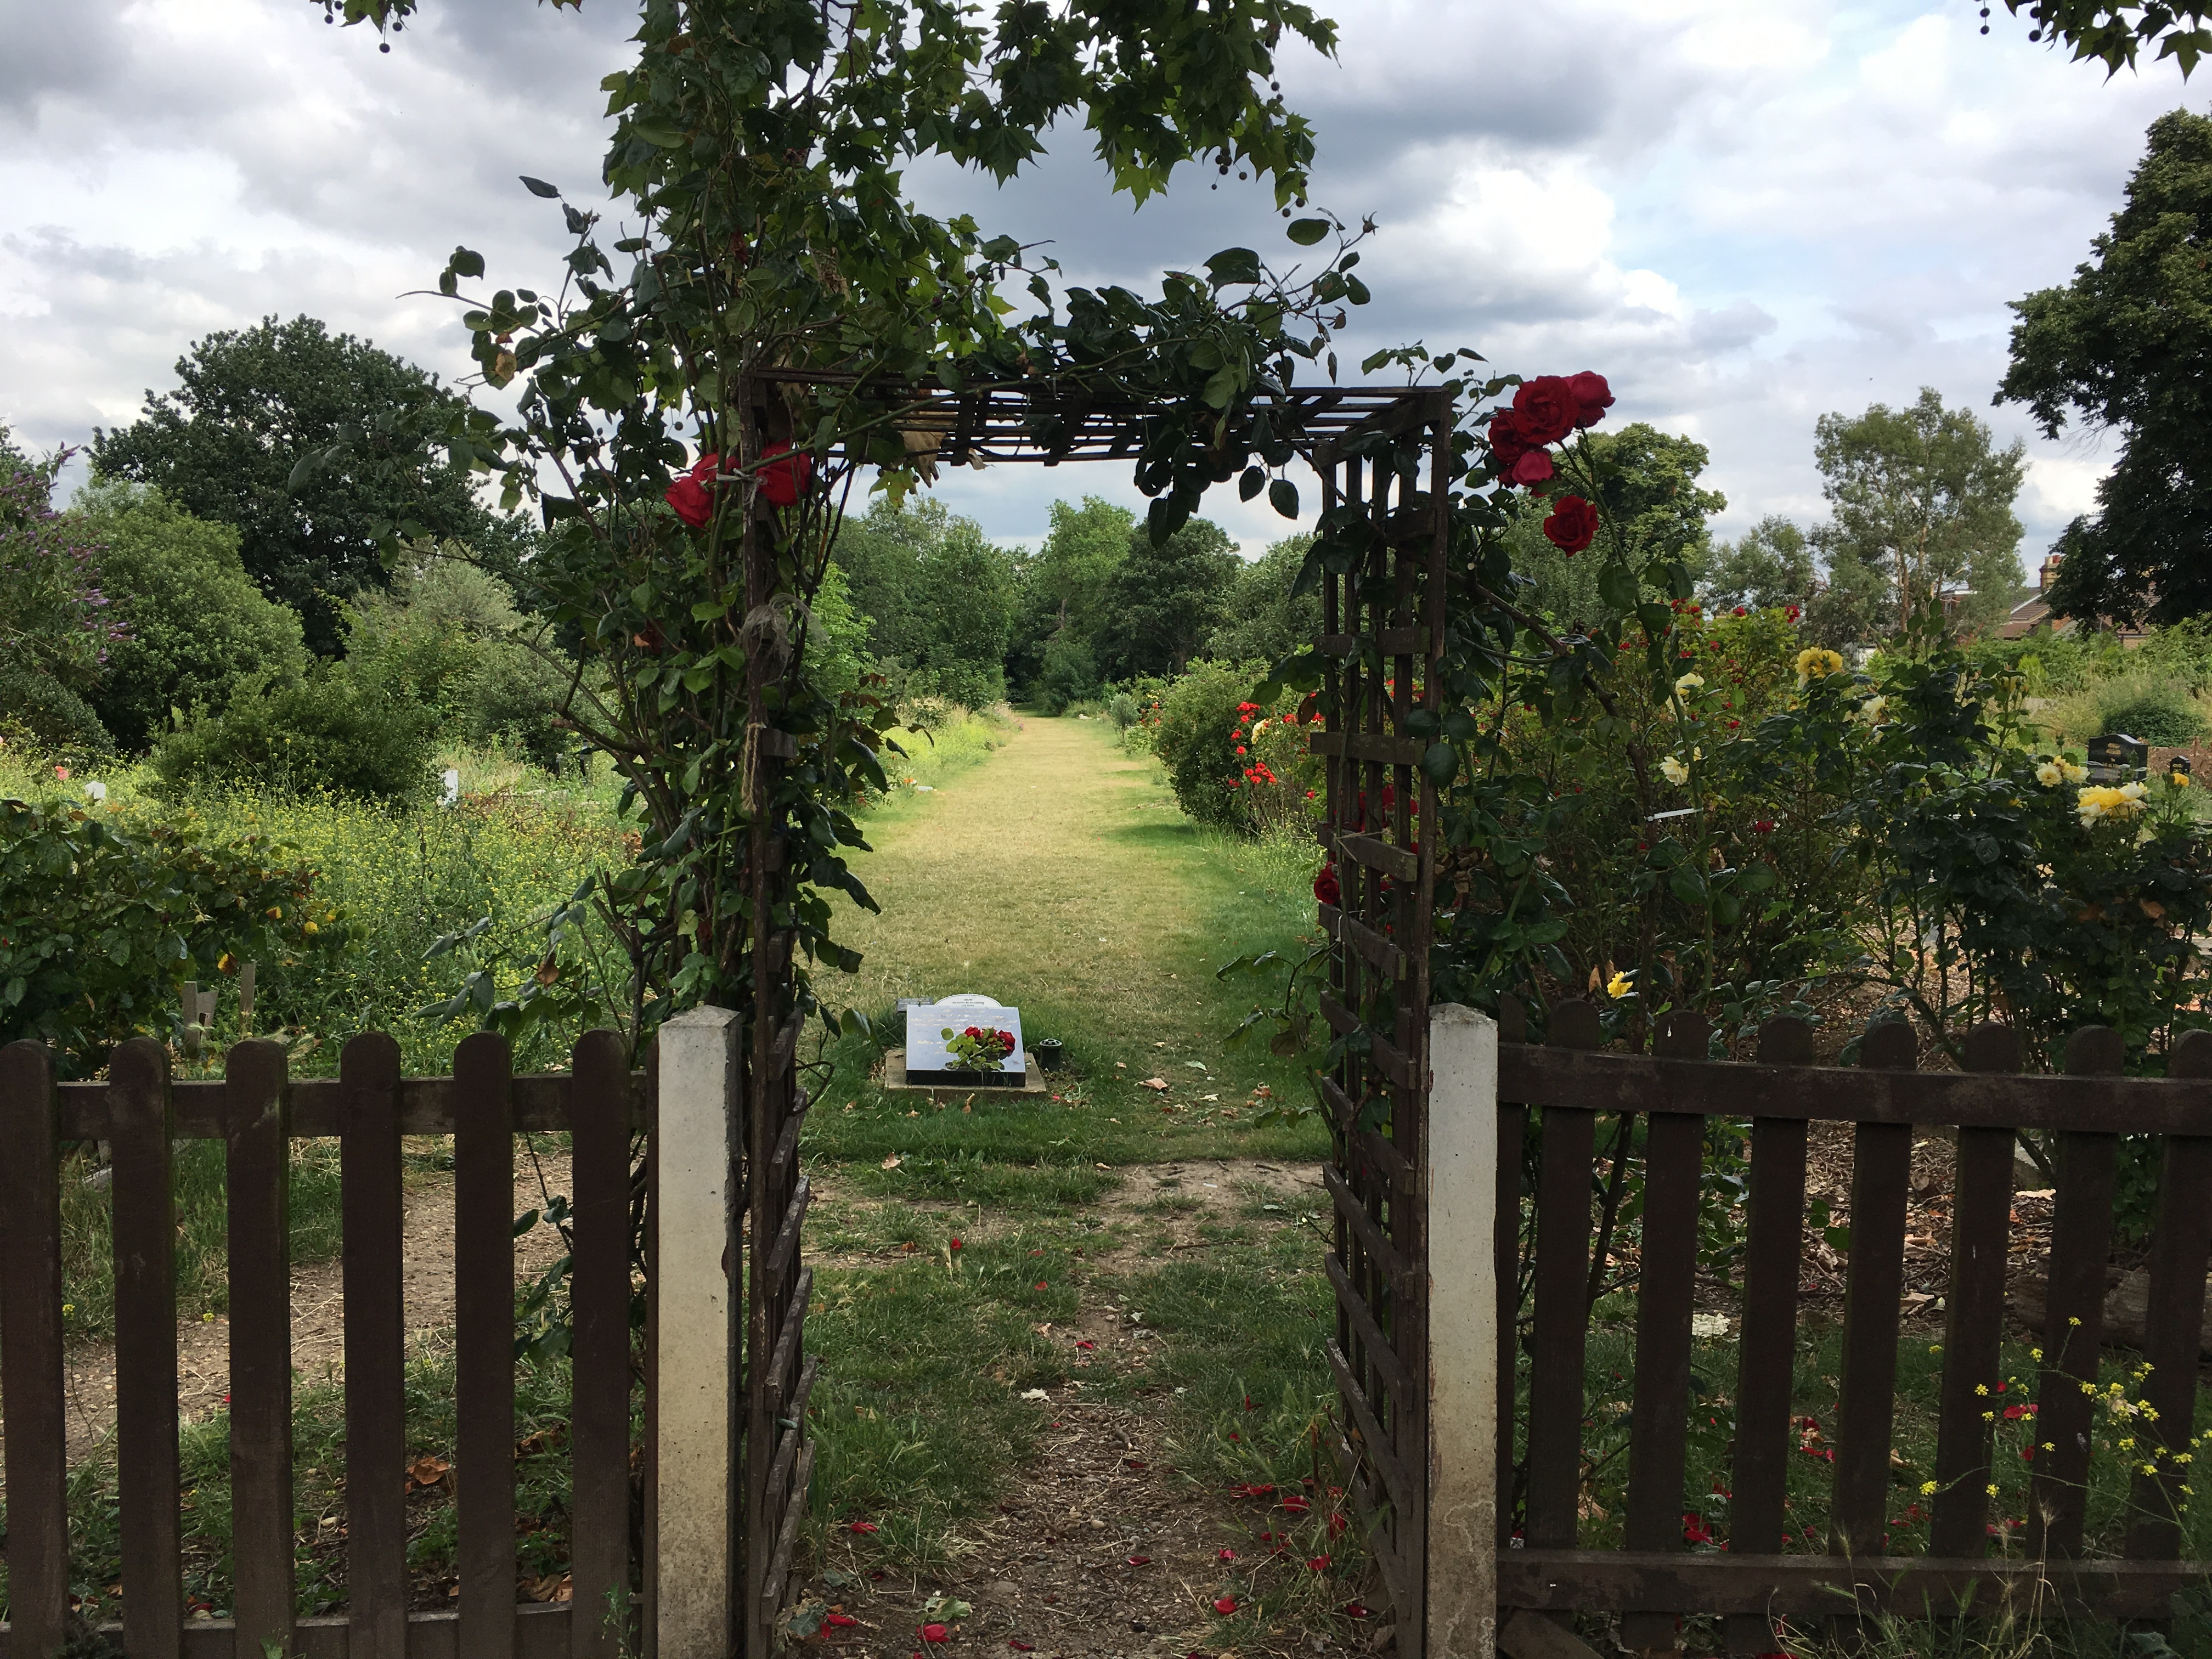 Wood grange Park Cemetery